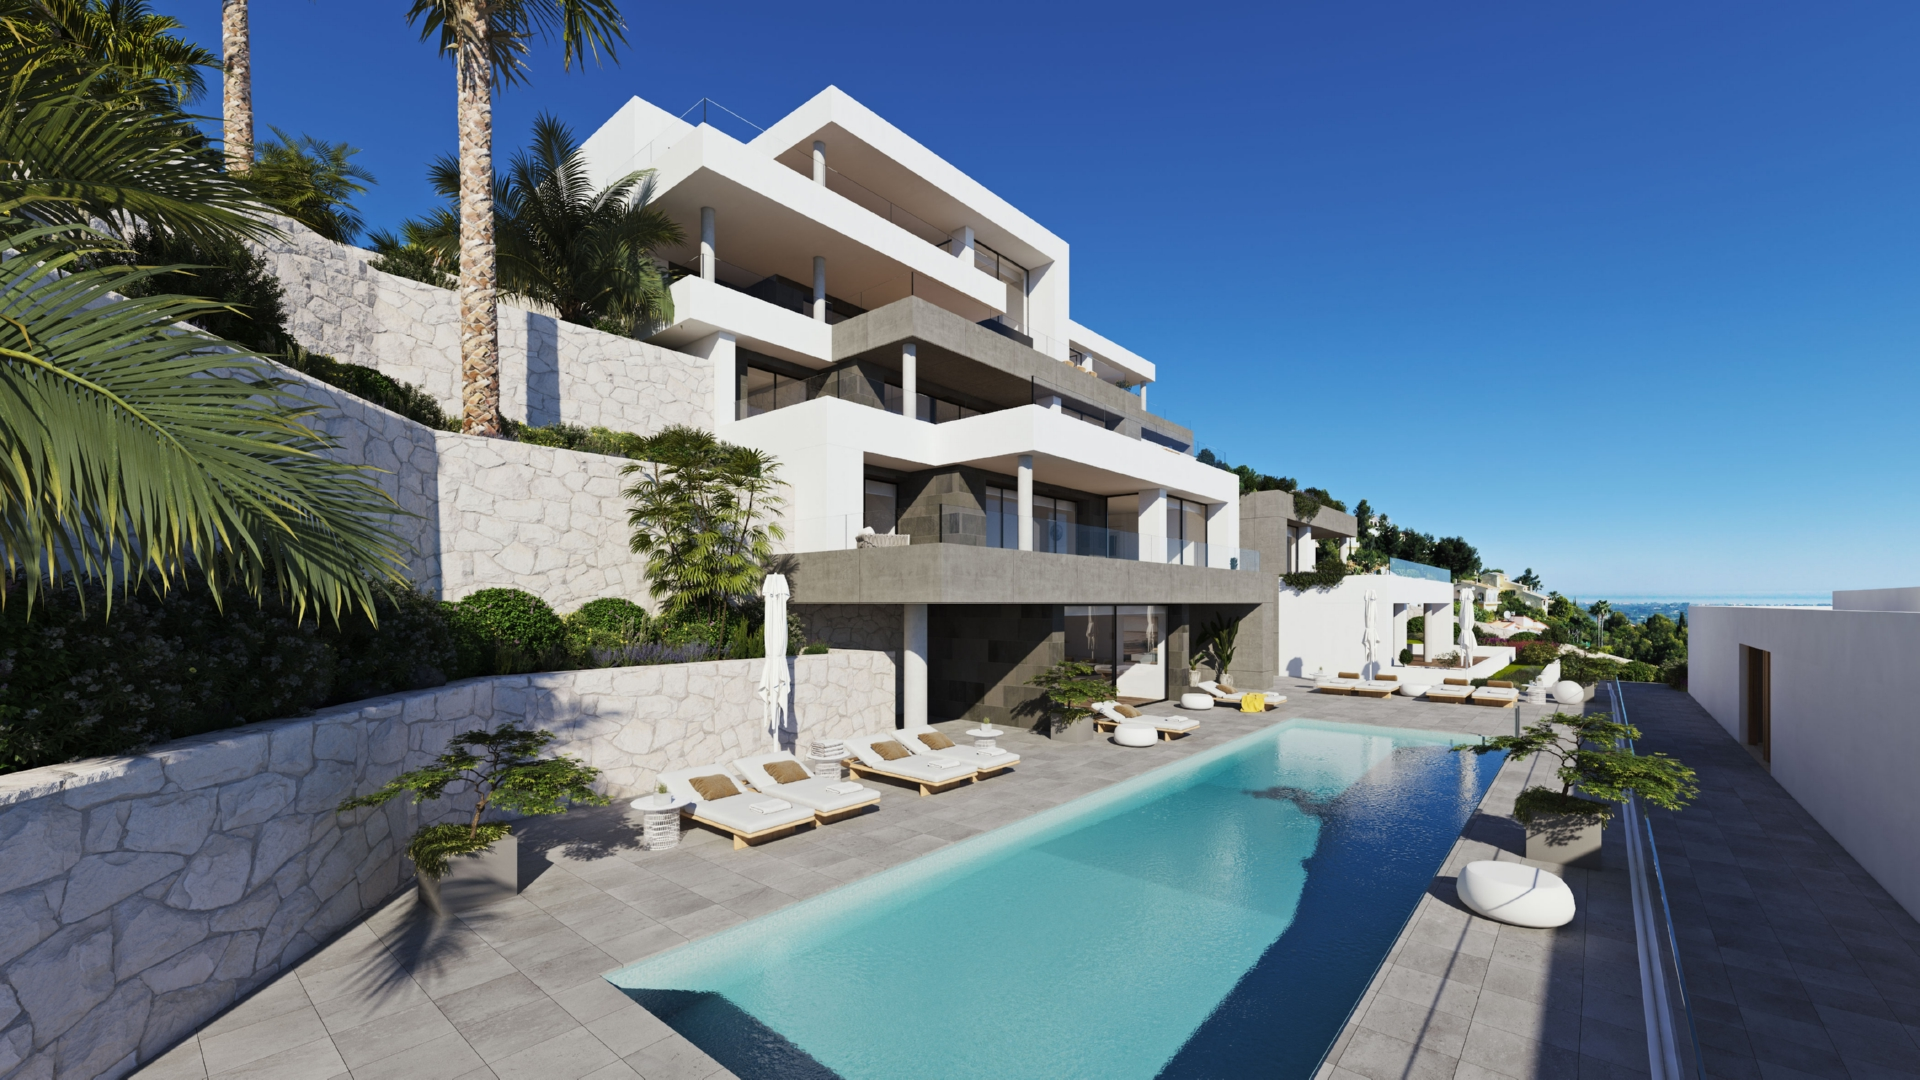 Luxury new 3 bedroom apartments in La Sella 5* Golf Resort in Denia